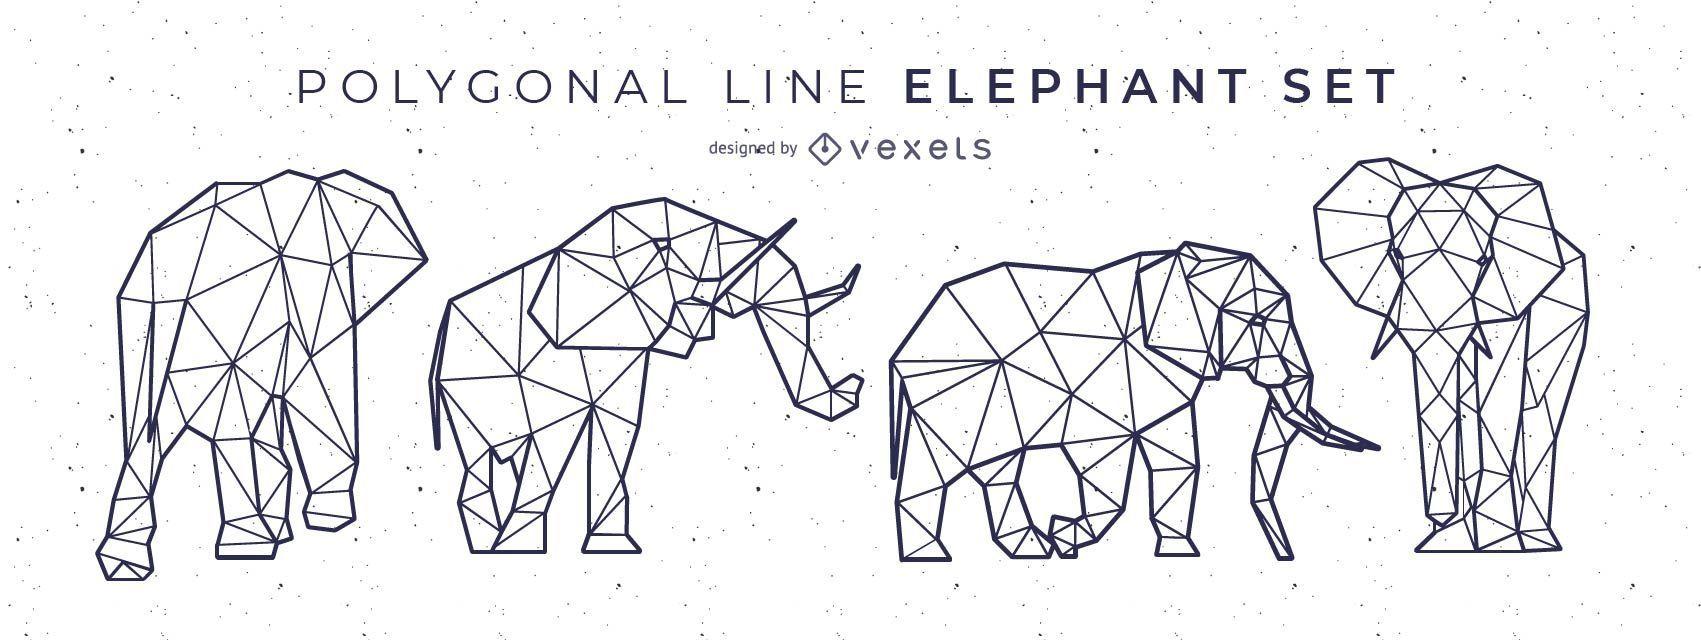 Polygonal Line Elephant Design